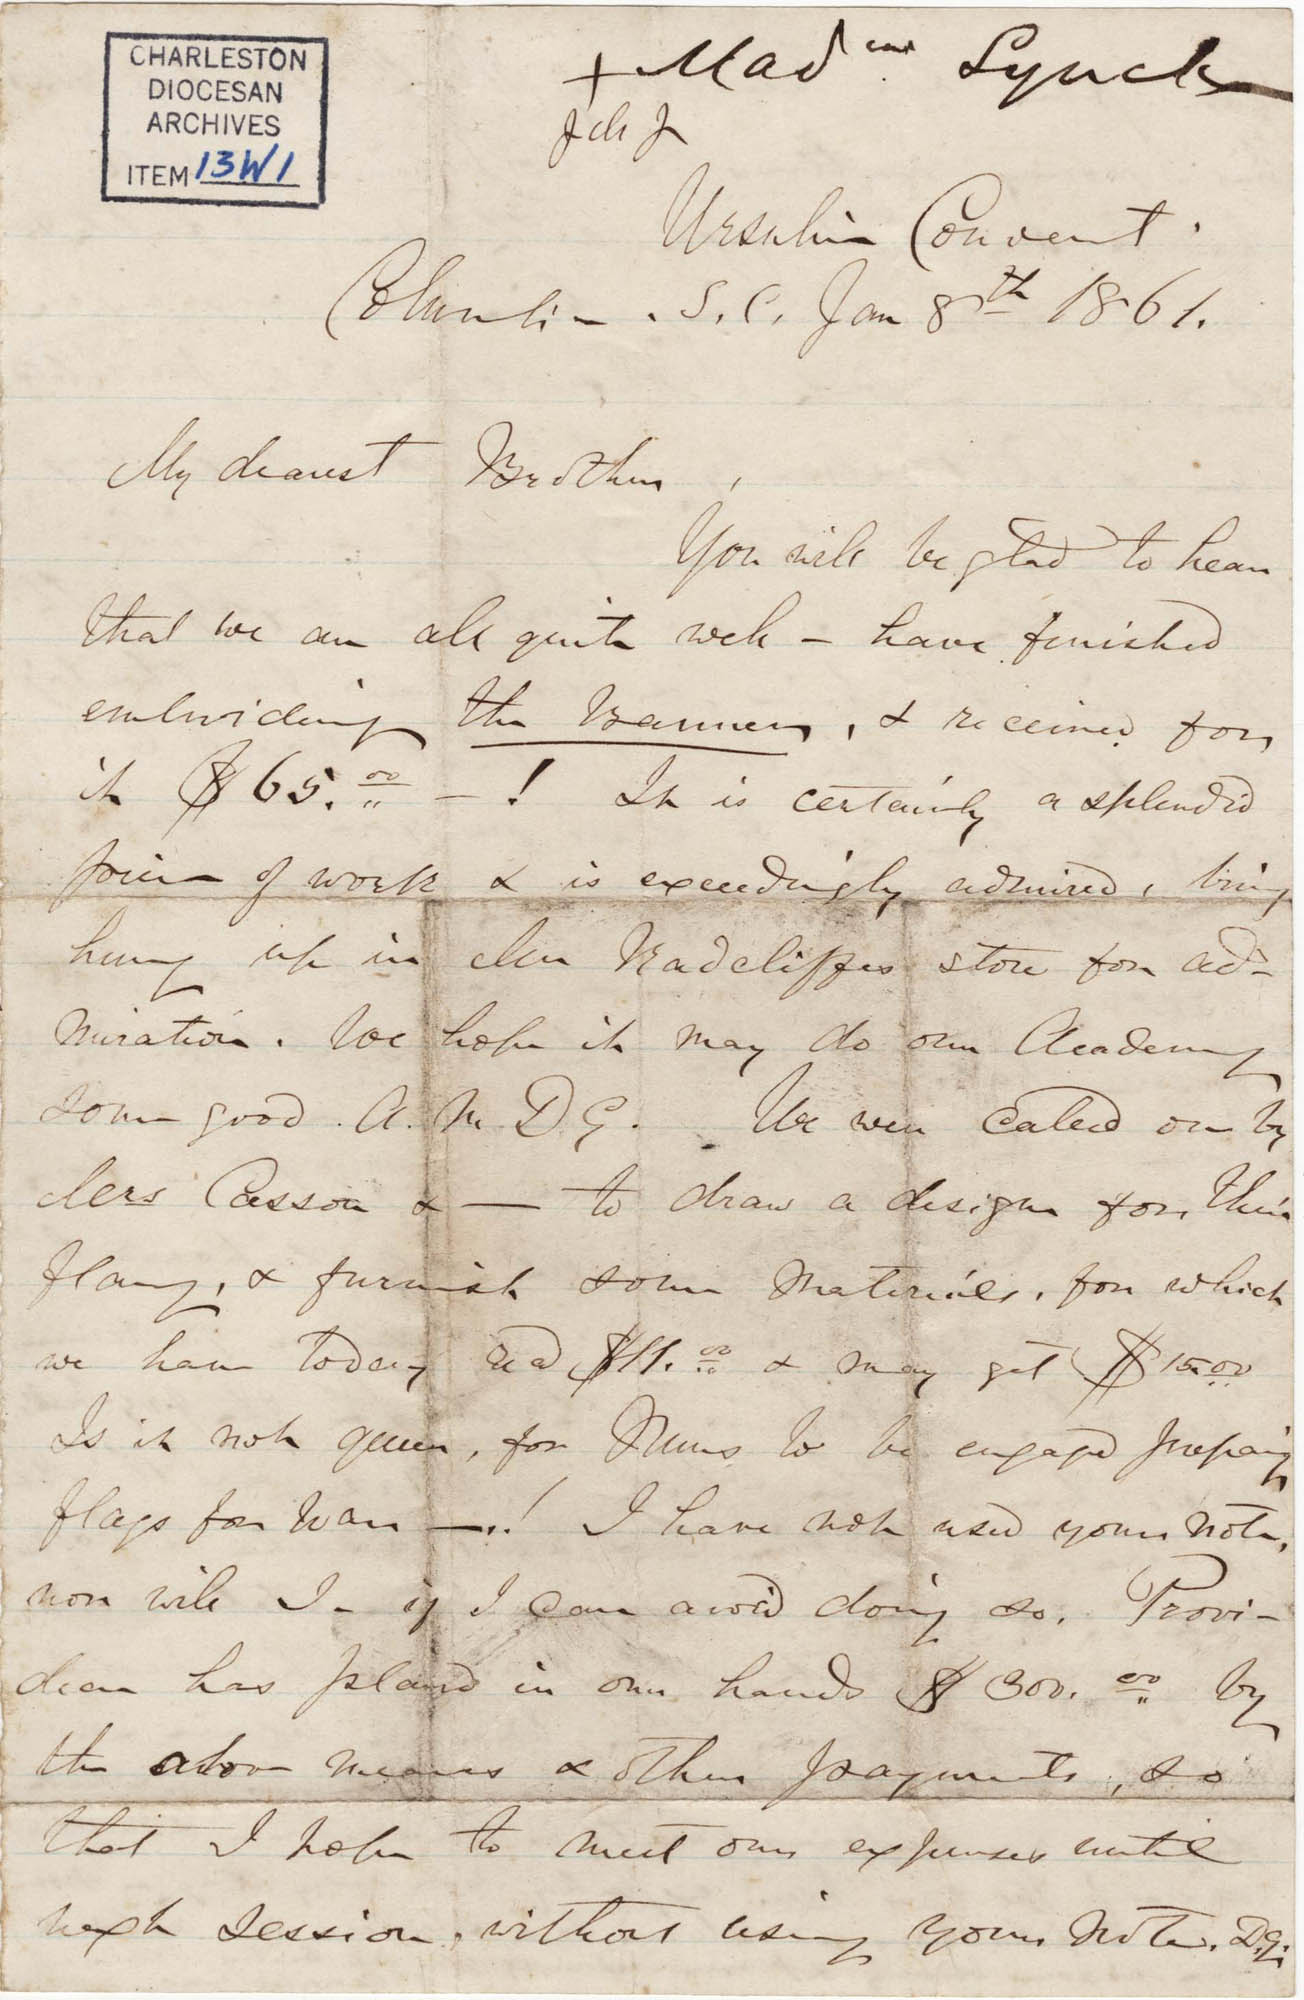 140. Madame Baptiste to Bp Patrick Lynch -- January 8, 1861